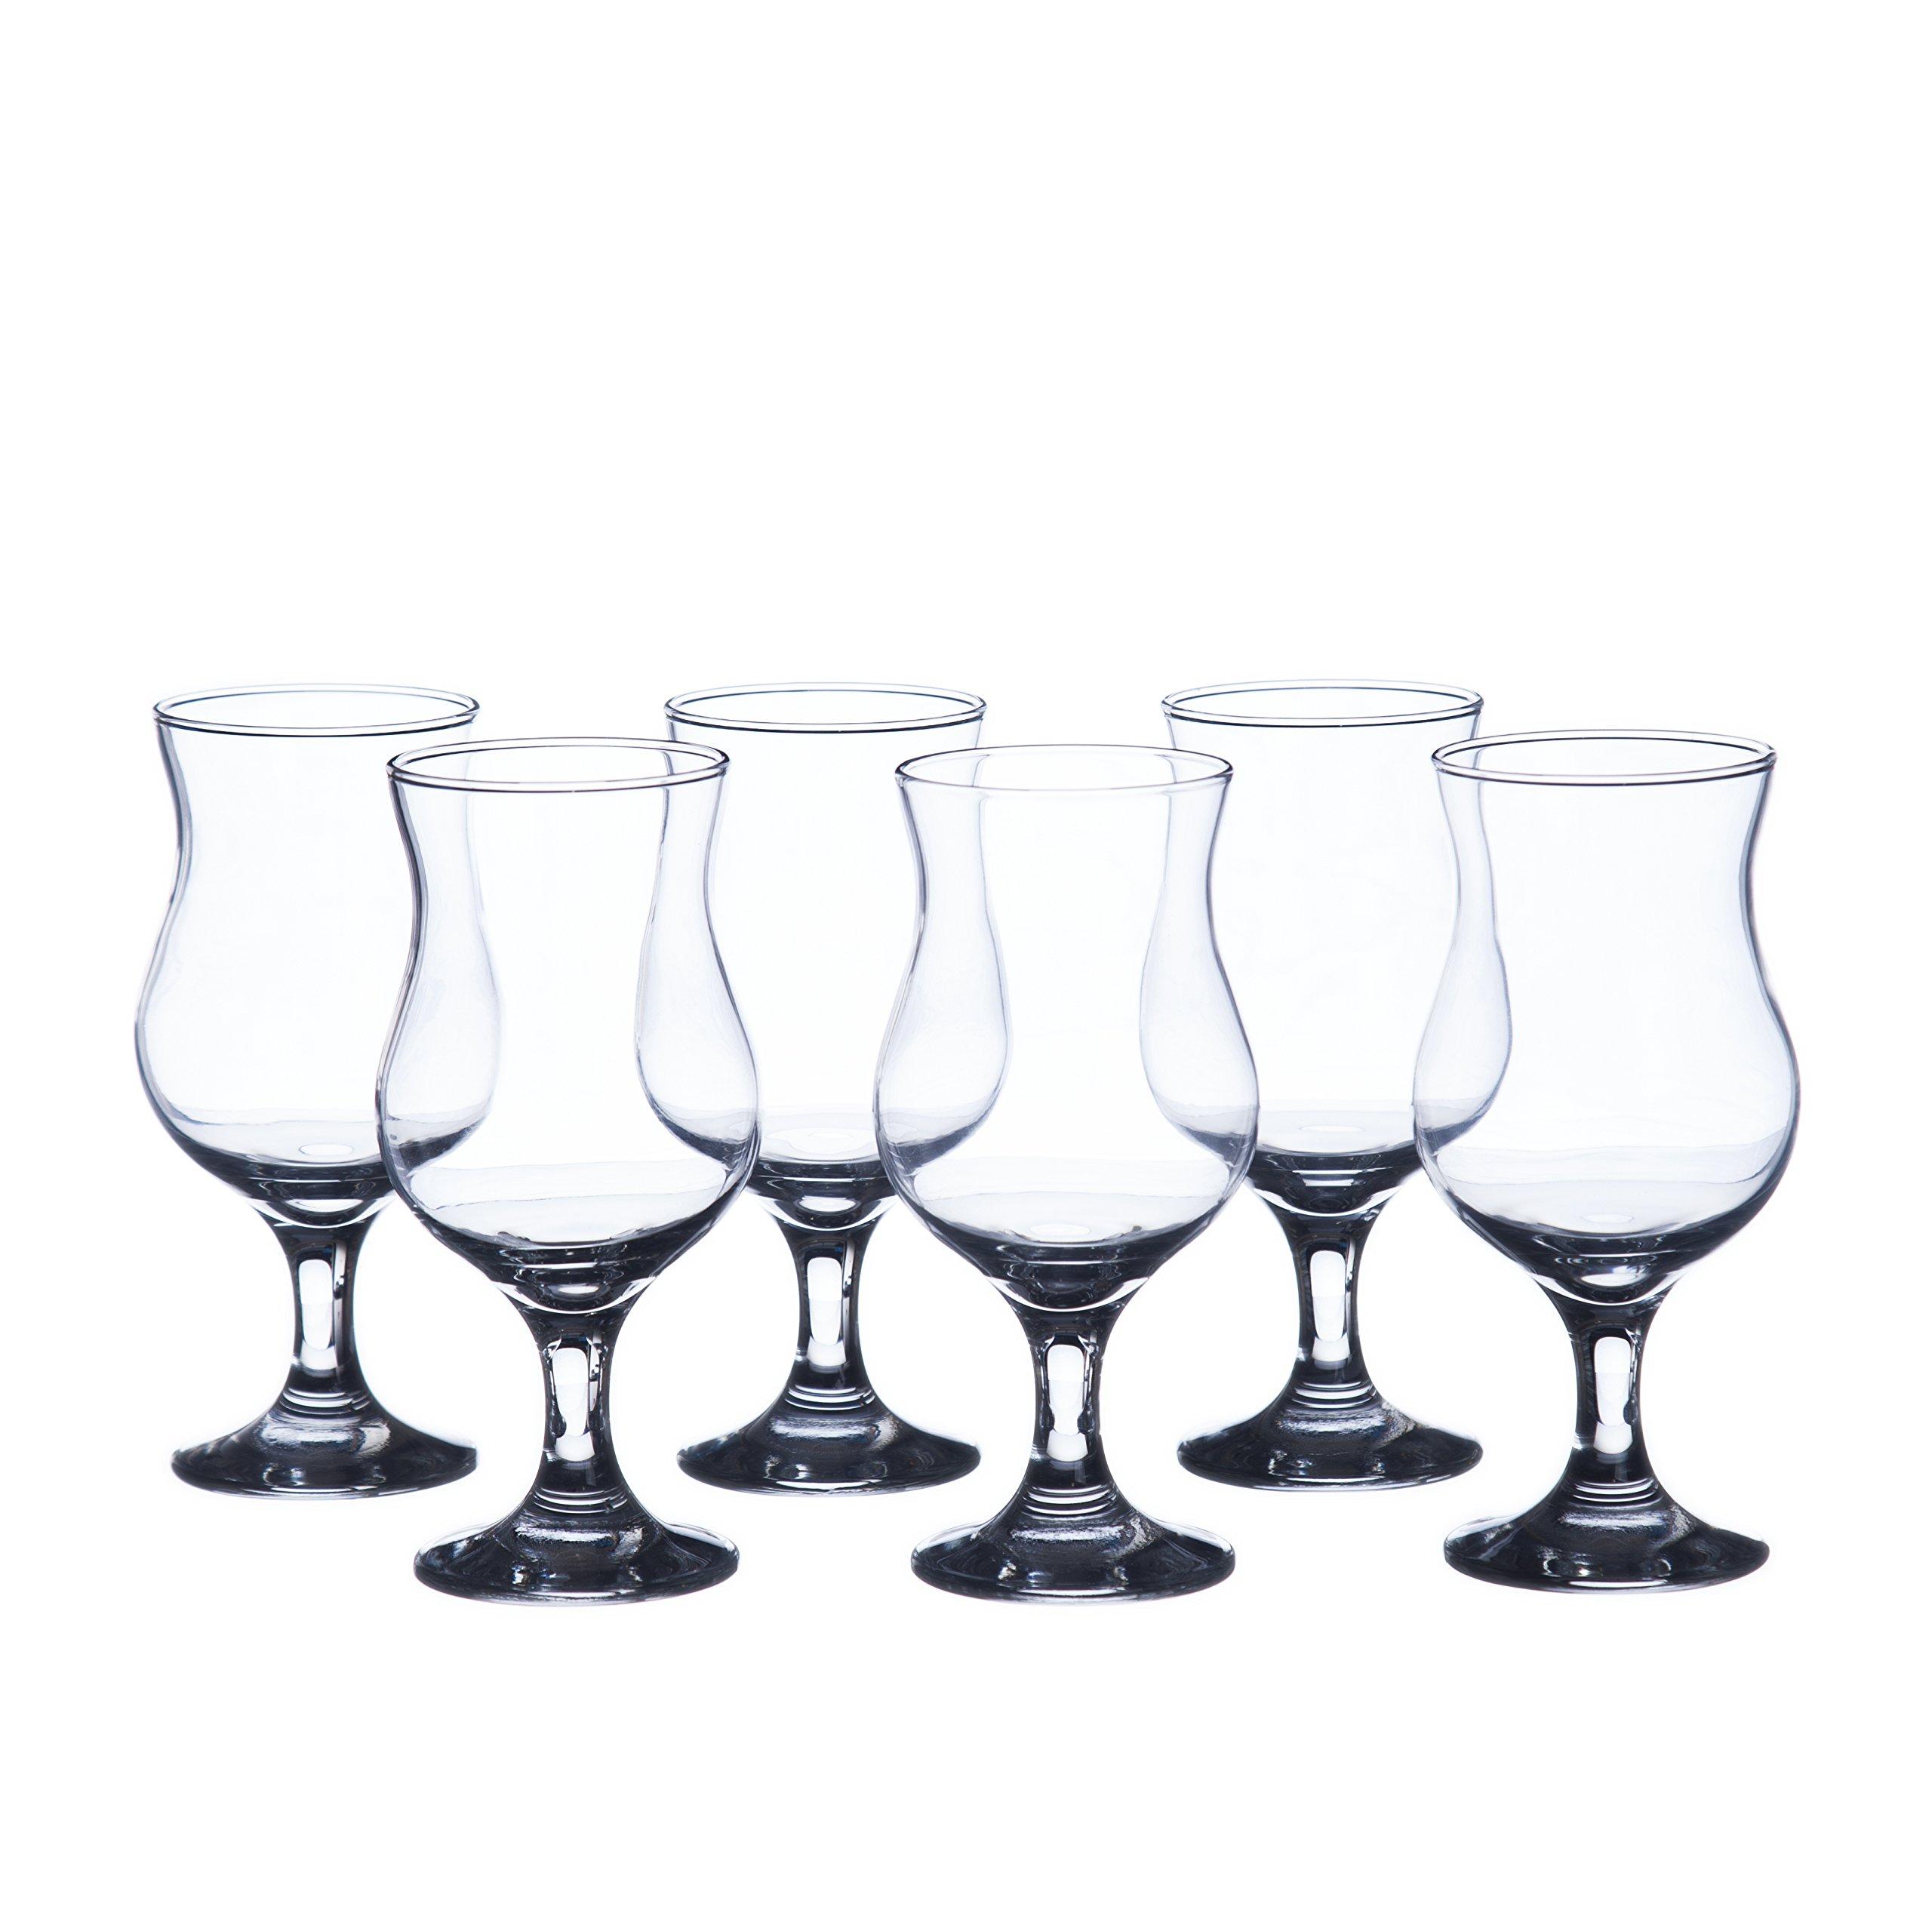 MADERIA Hurricane Cocktails Glasses Sets, 13 oz. (6-piece set, 12-piece set), Durable Tempered Glass, Restaurant&Hotel Quality (12)